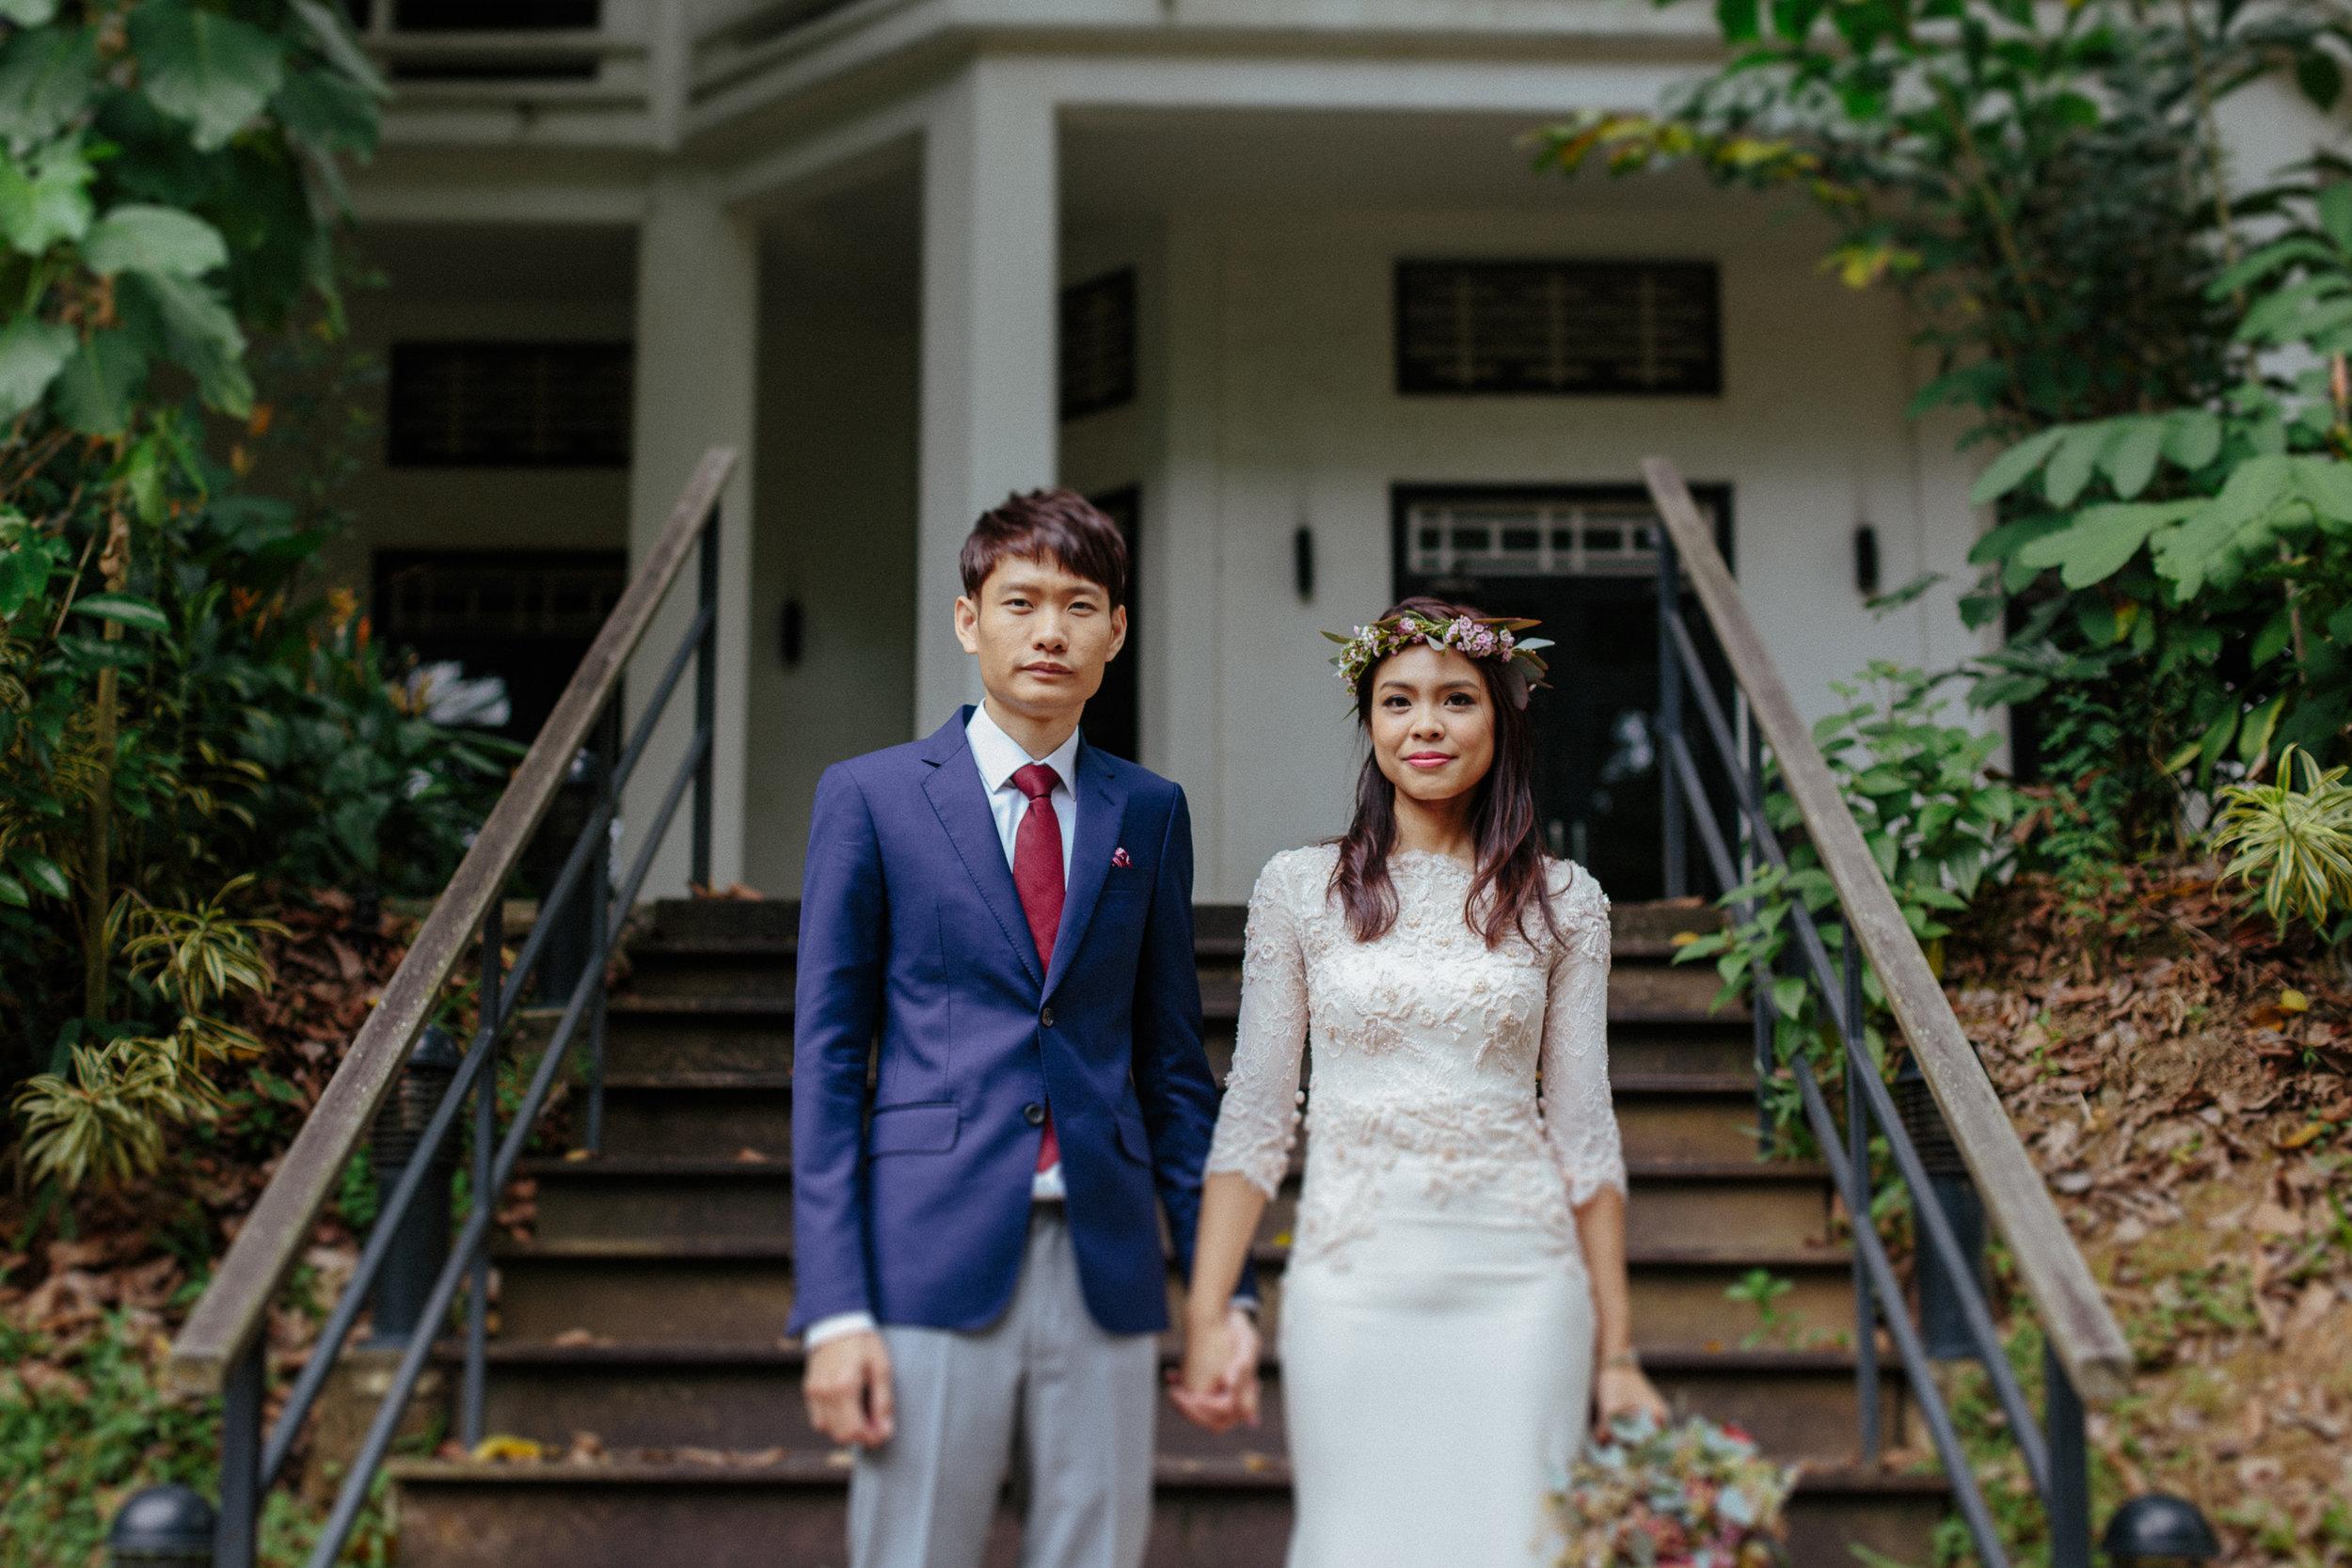 singapore-wedding-photographer-fadilah-kwan-073.jpg